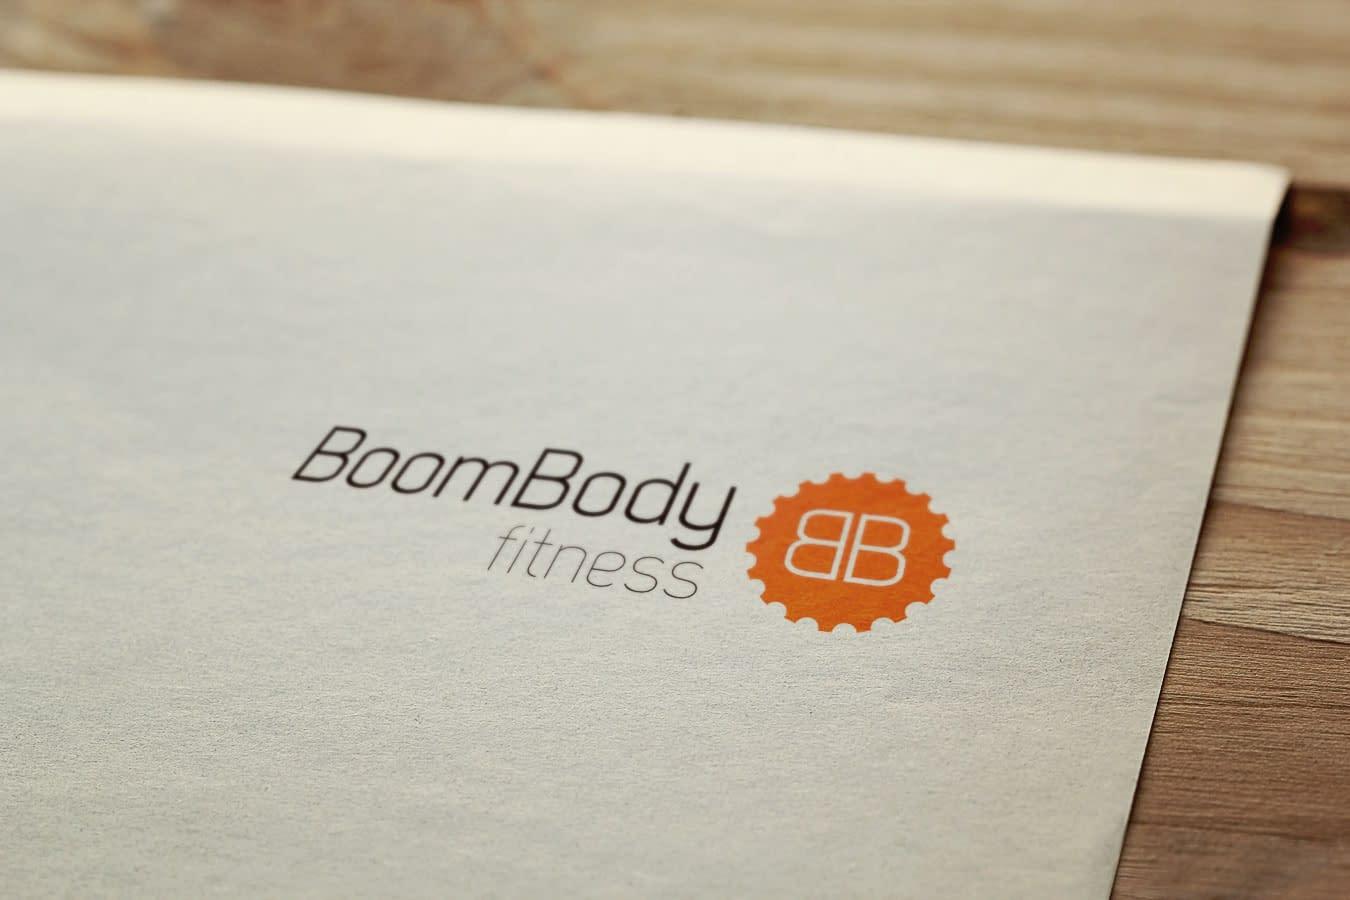 logos_boombody2